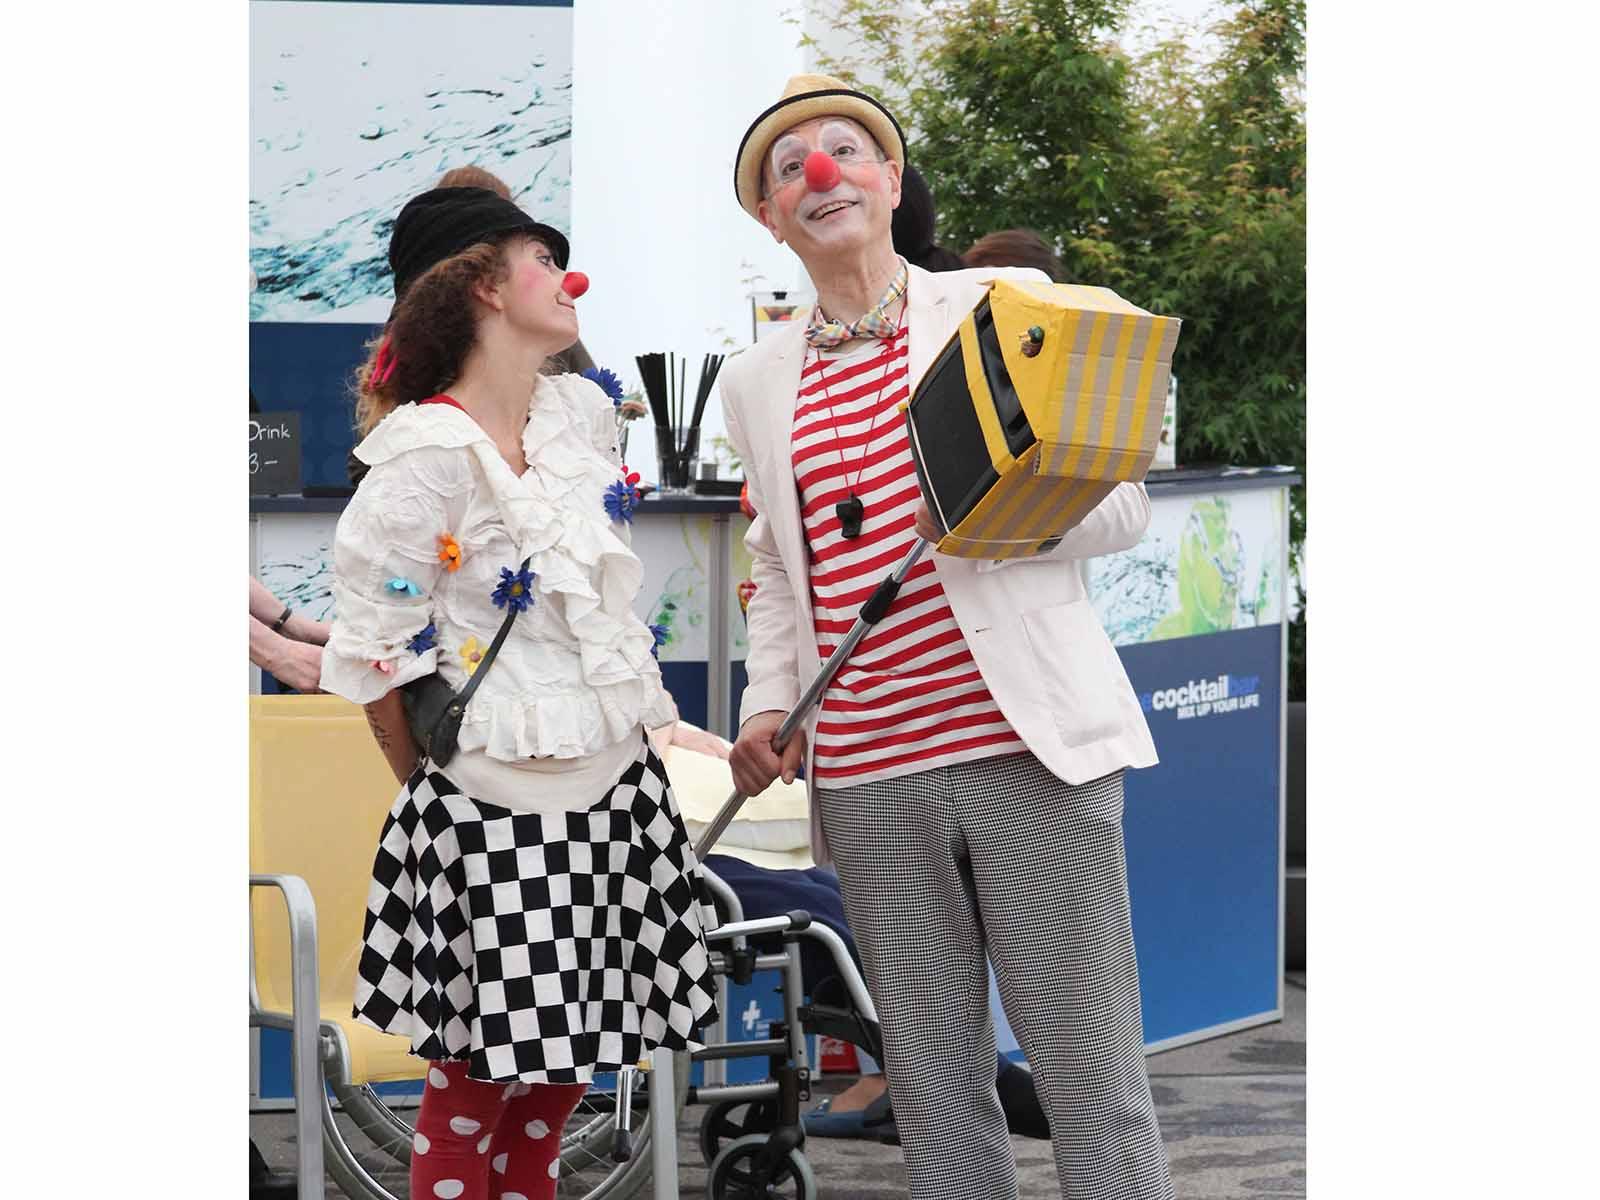 Die Gero Clowns Mozzarella und Pepo.